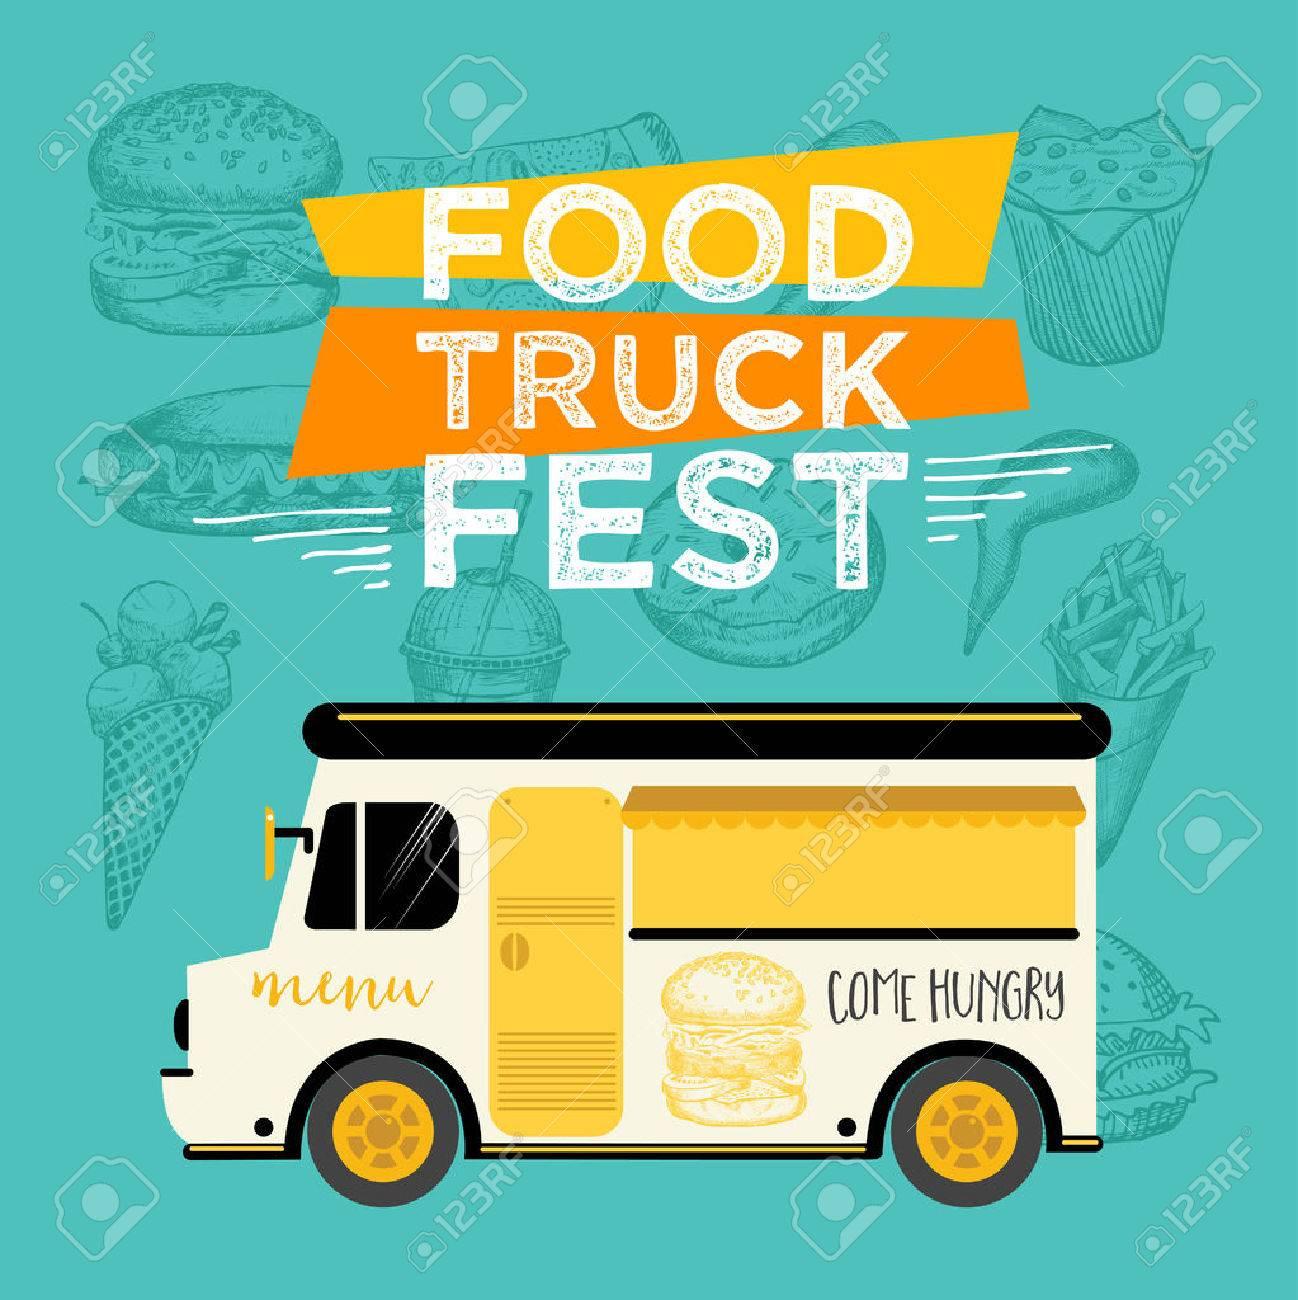 Food truck festival menu food brochure, street food template design. Vintage creative party invitation with hand-drawn graphic. Vector food menu flyer. Hipster menu board. - 58782627